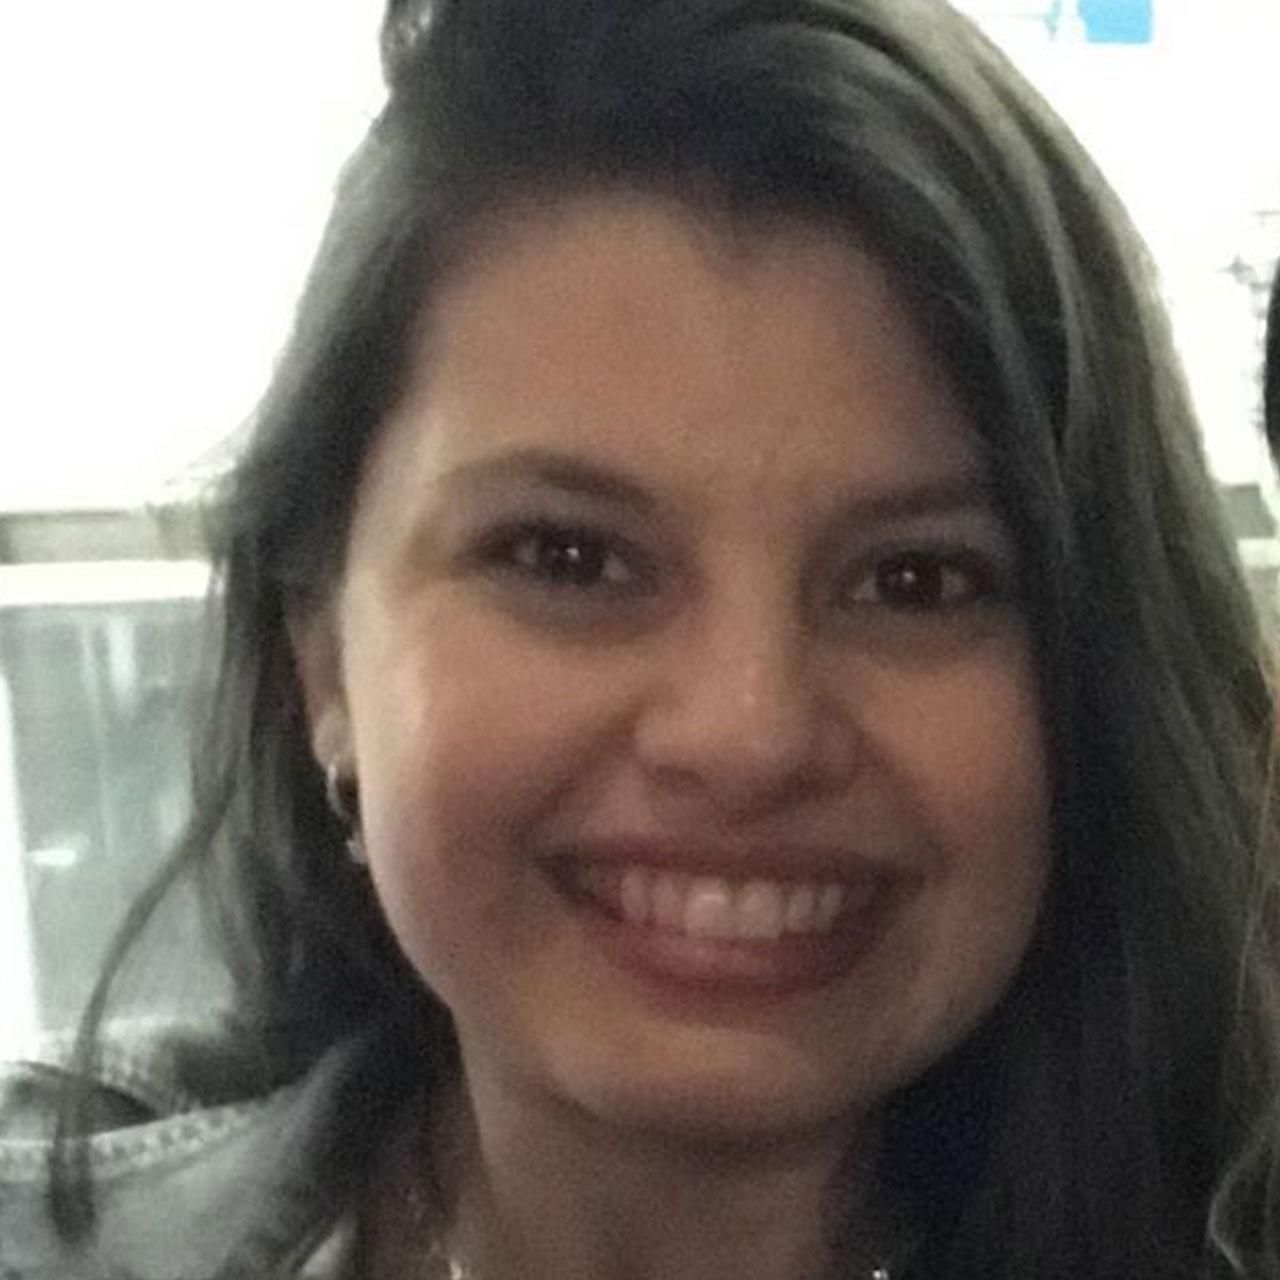 Thais Mei de Oliveira